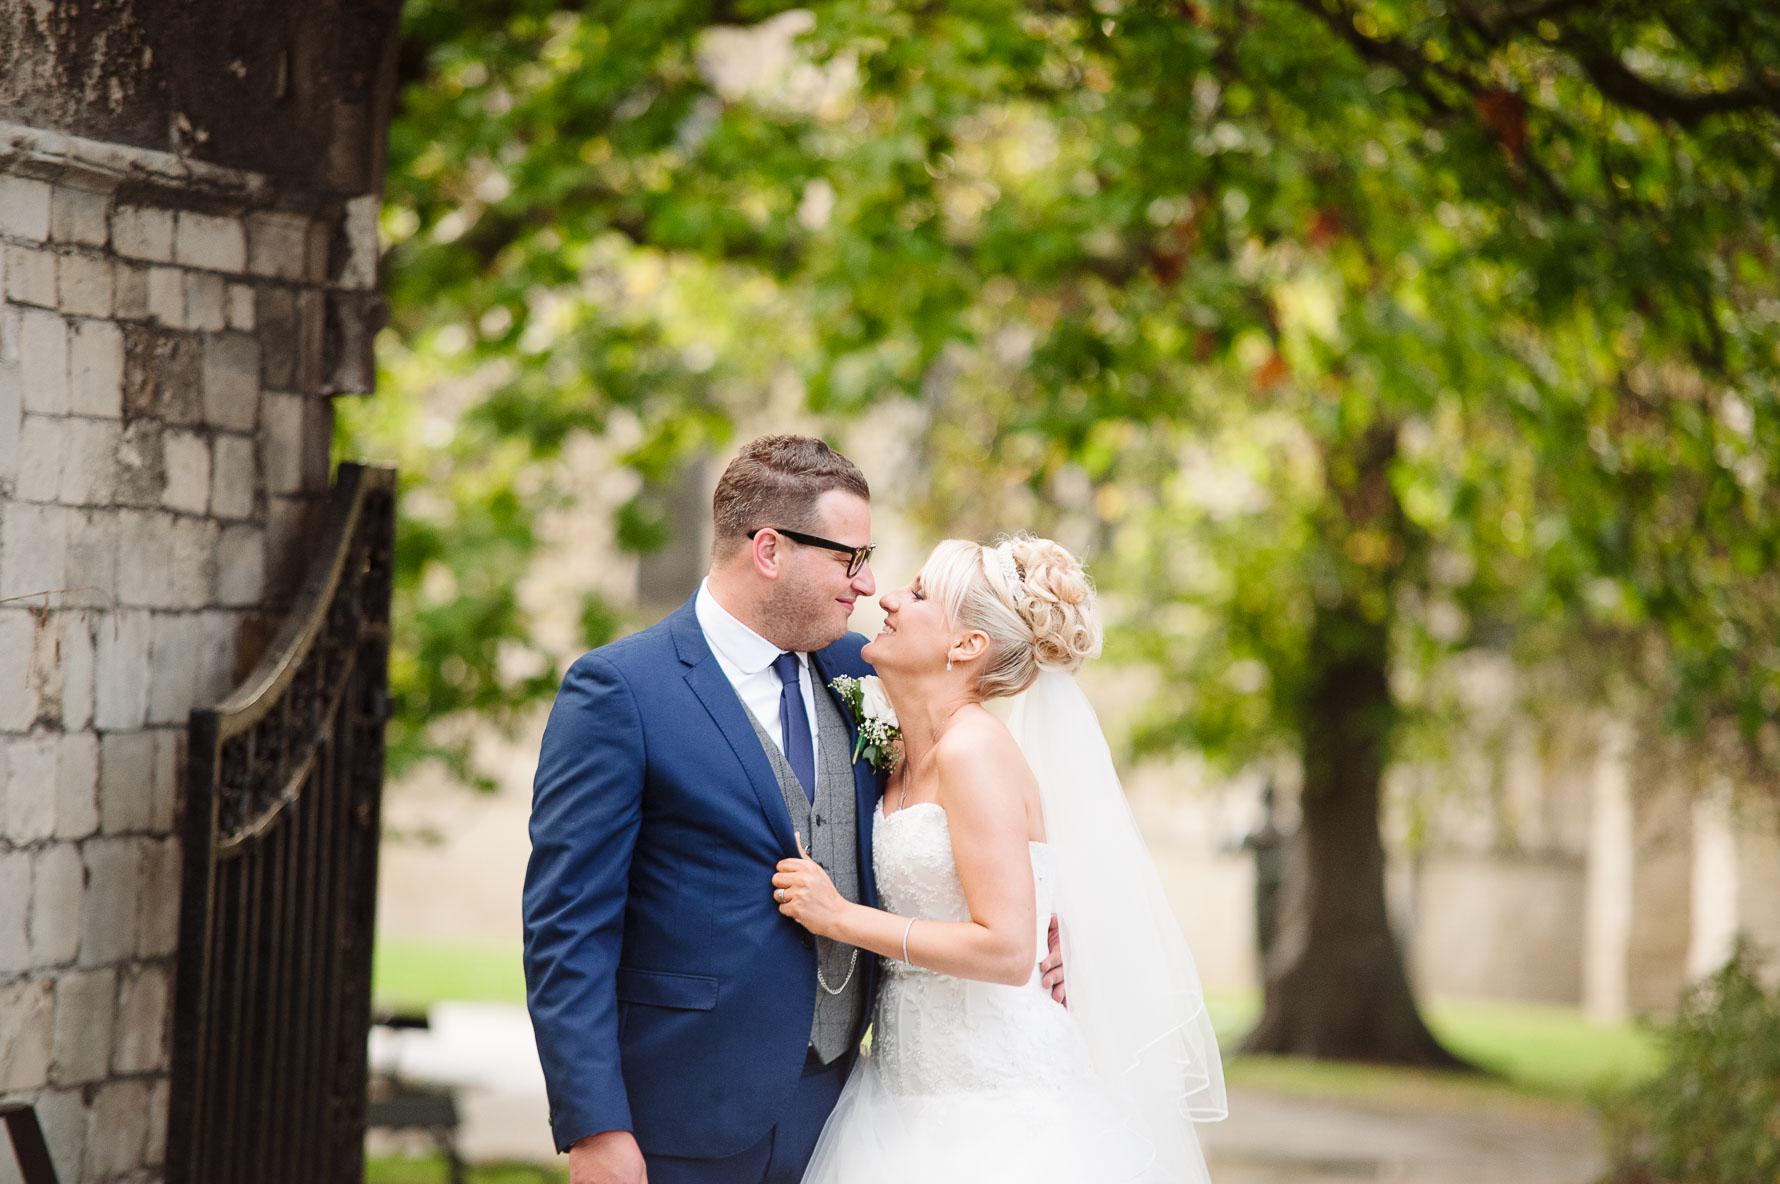 Canterbury Cathedral Lodge Wedding74-20141004 1375